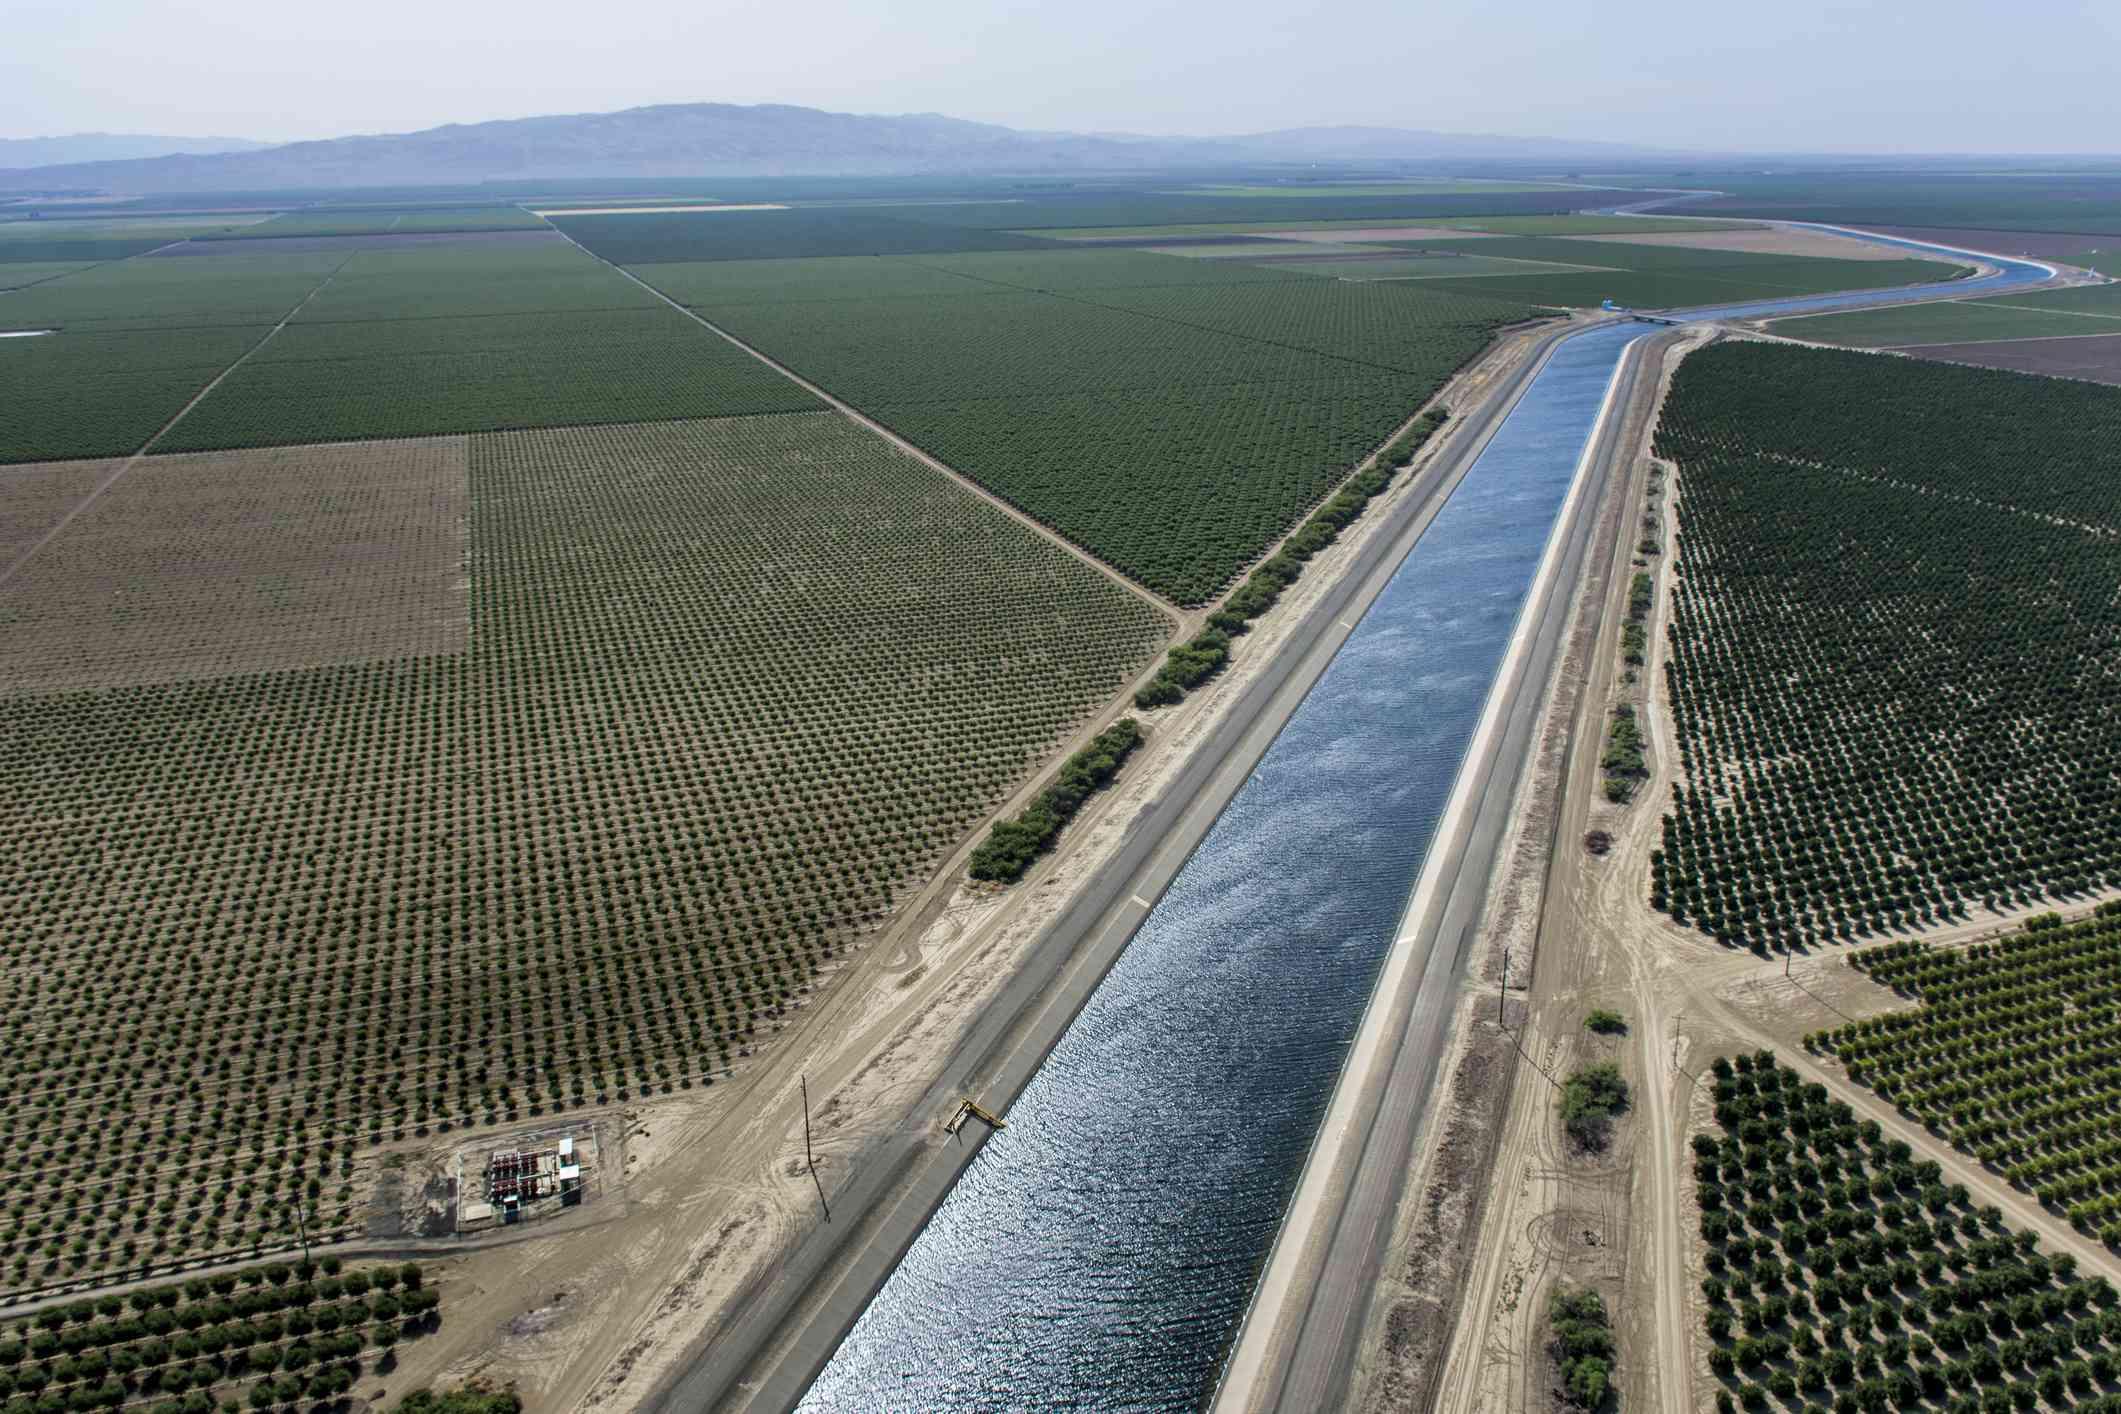 The California aqueduct flows thru the western edge of the Mojave Desert.